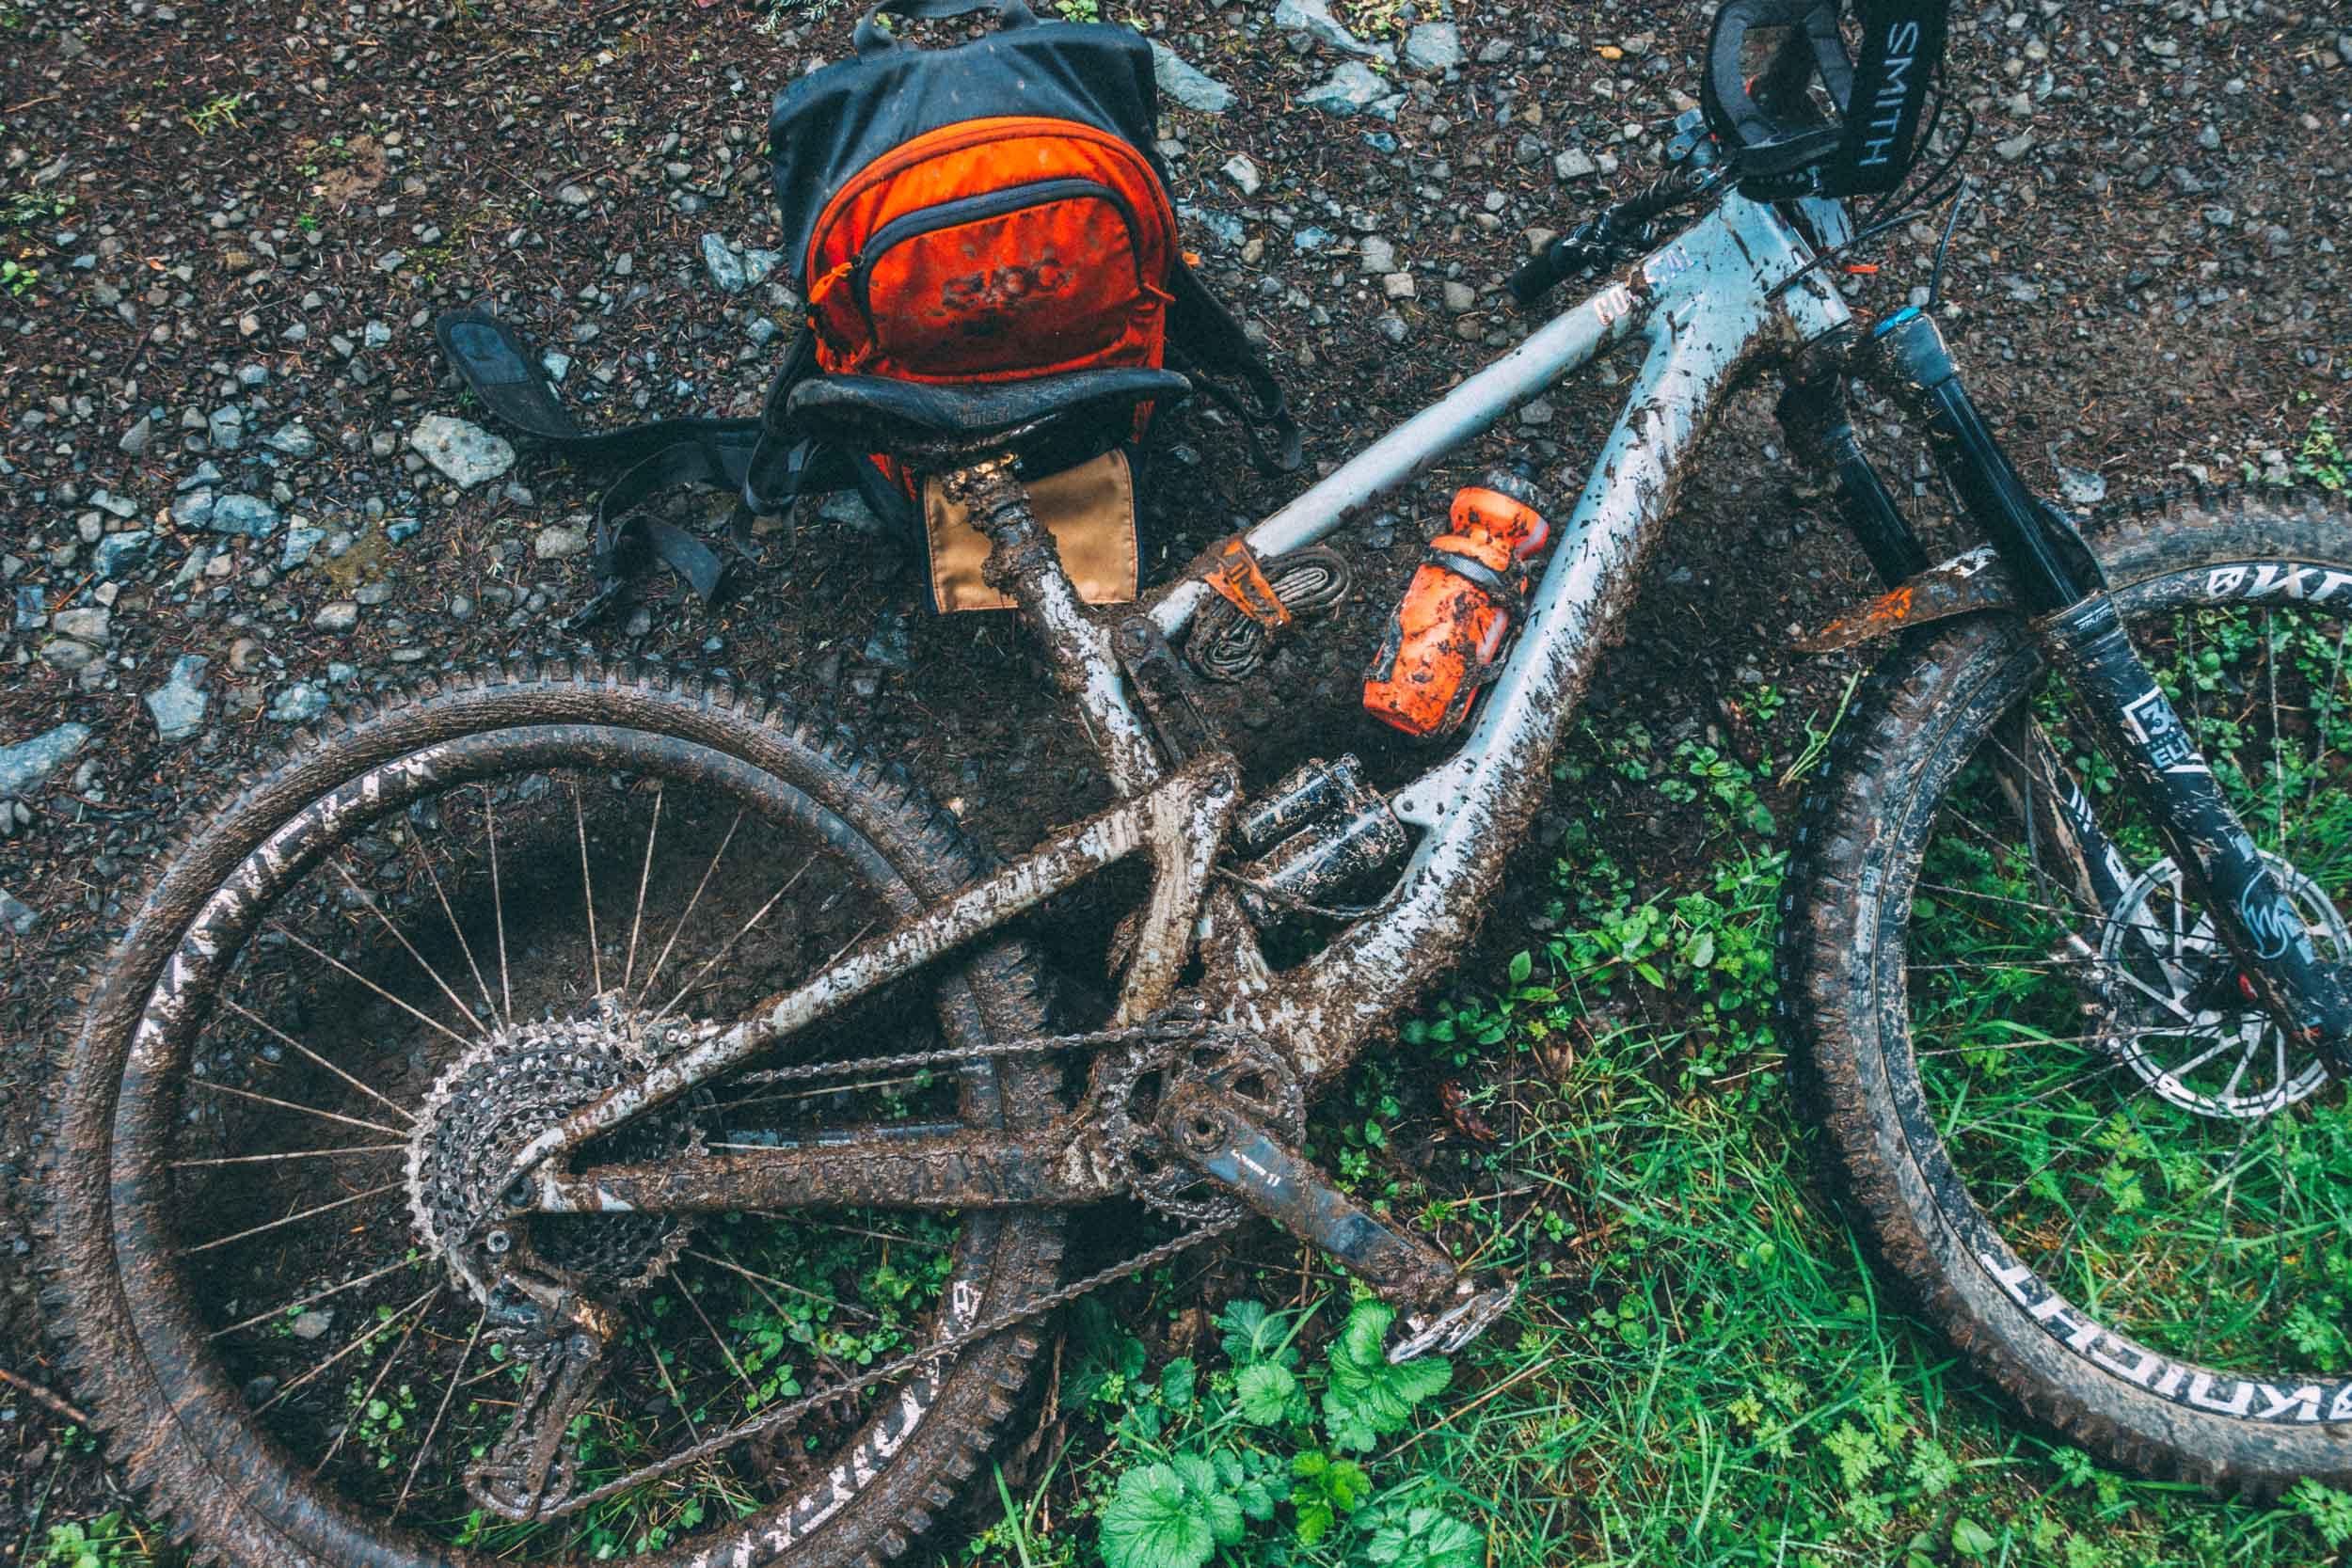 Tiger_Enduro_Cascadia_Dirt_Cup (5).jpg